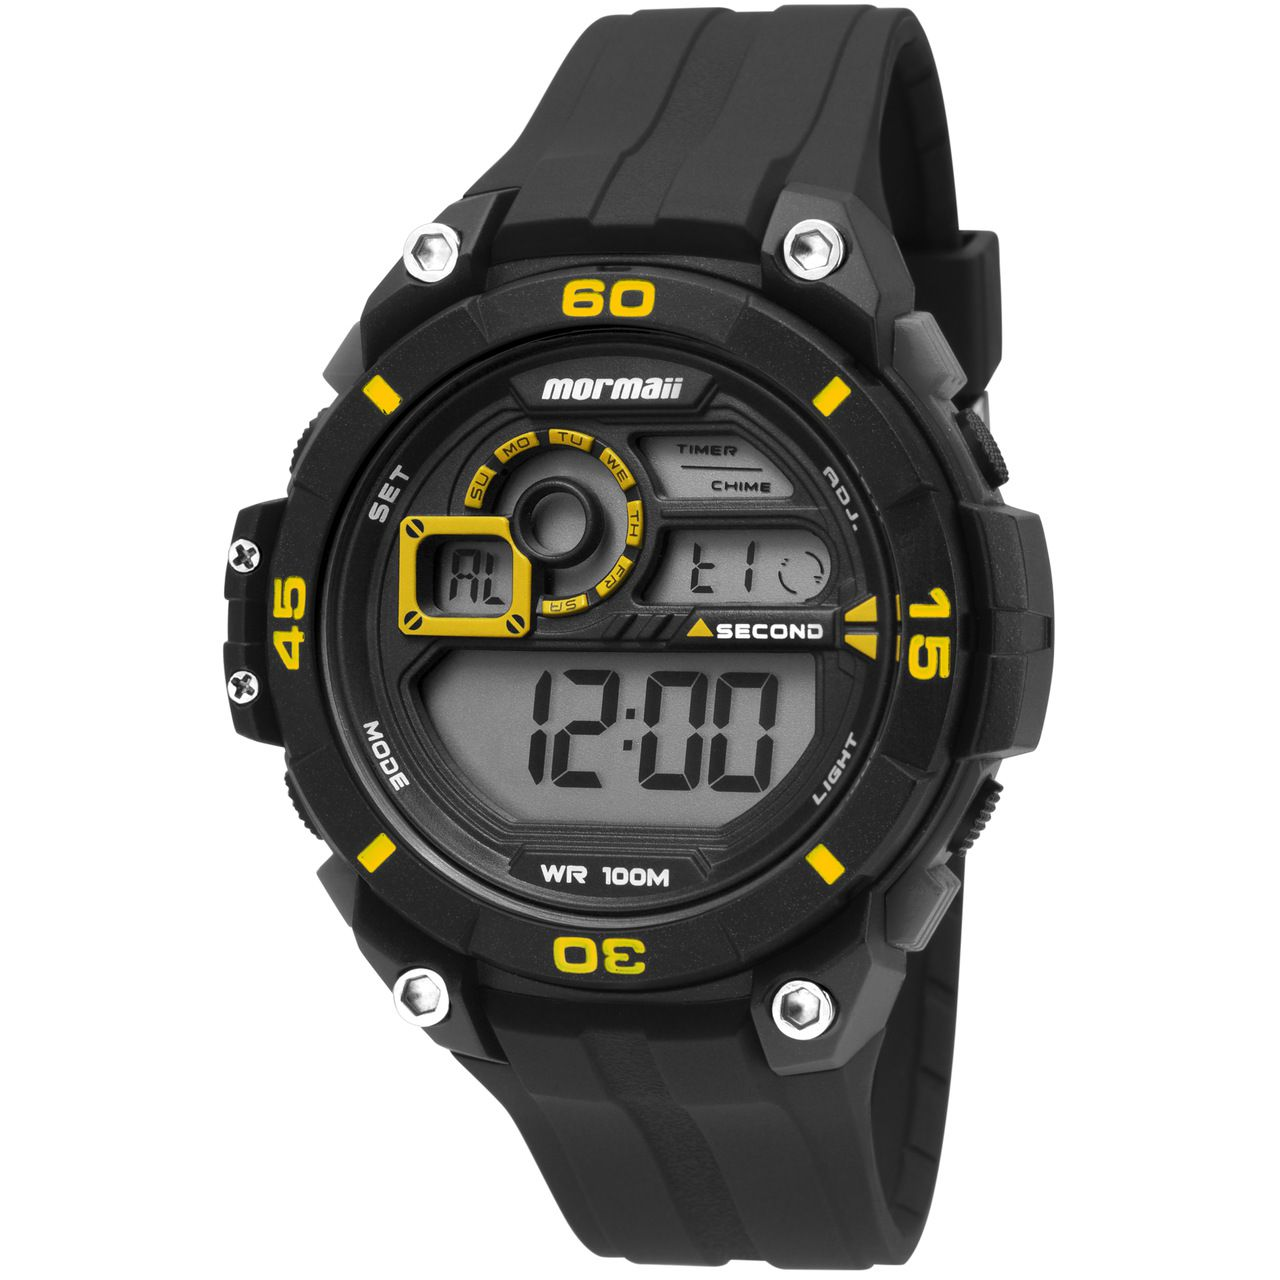 Relógio Mormaii Mo2019/8y Masculino Esportivo Digital Preto com Amarelo